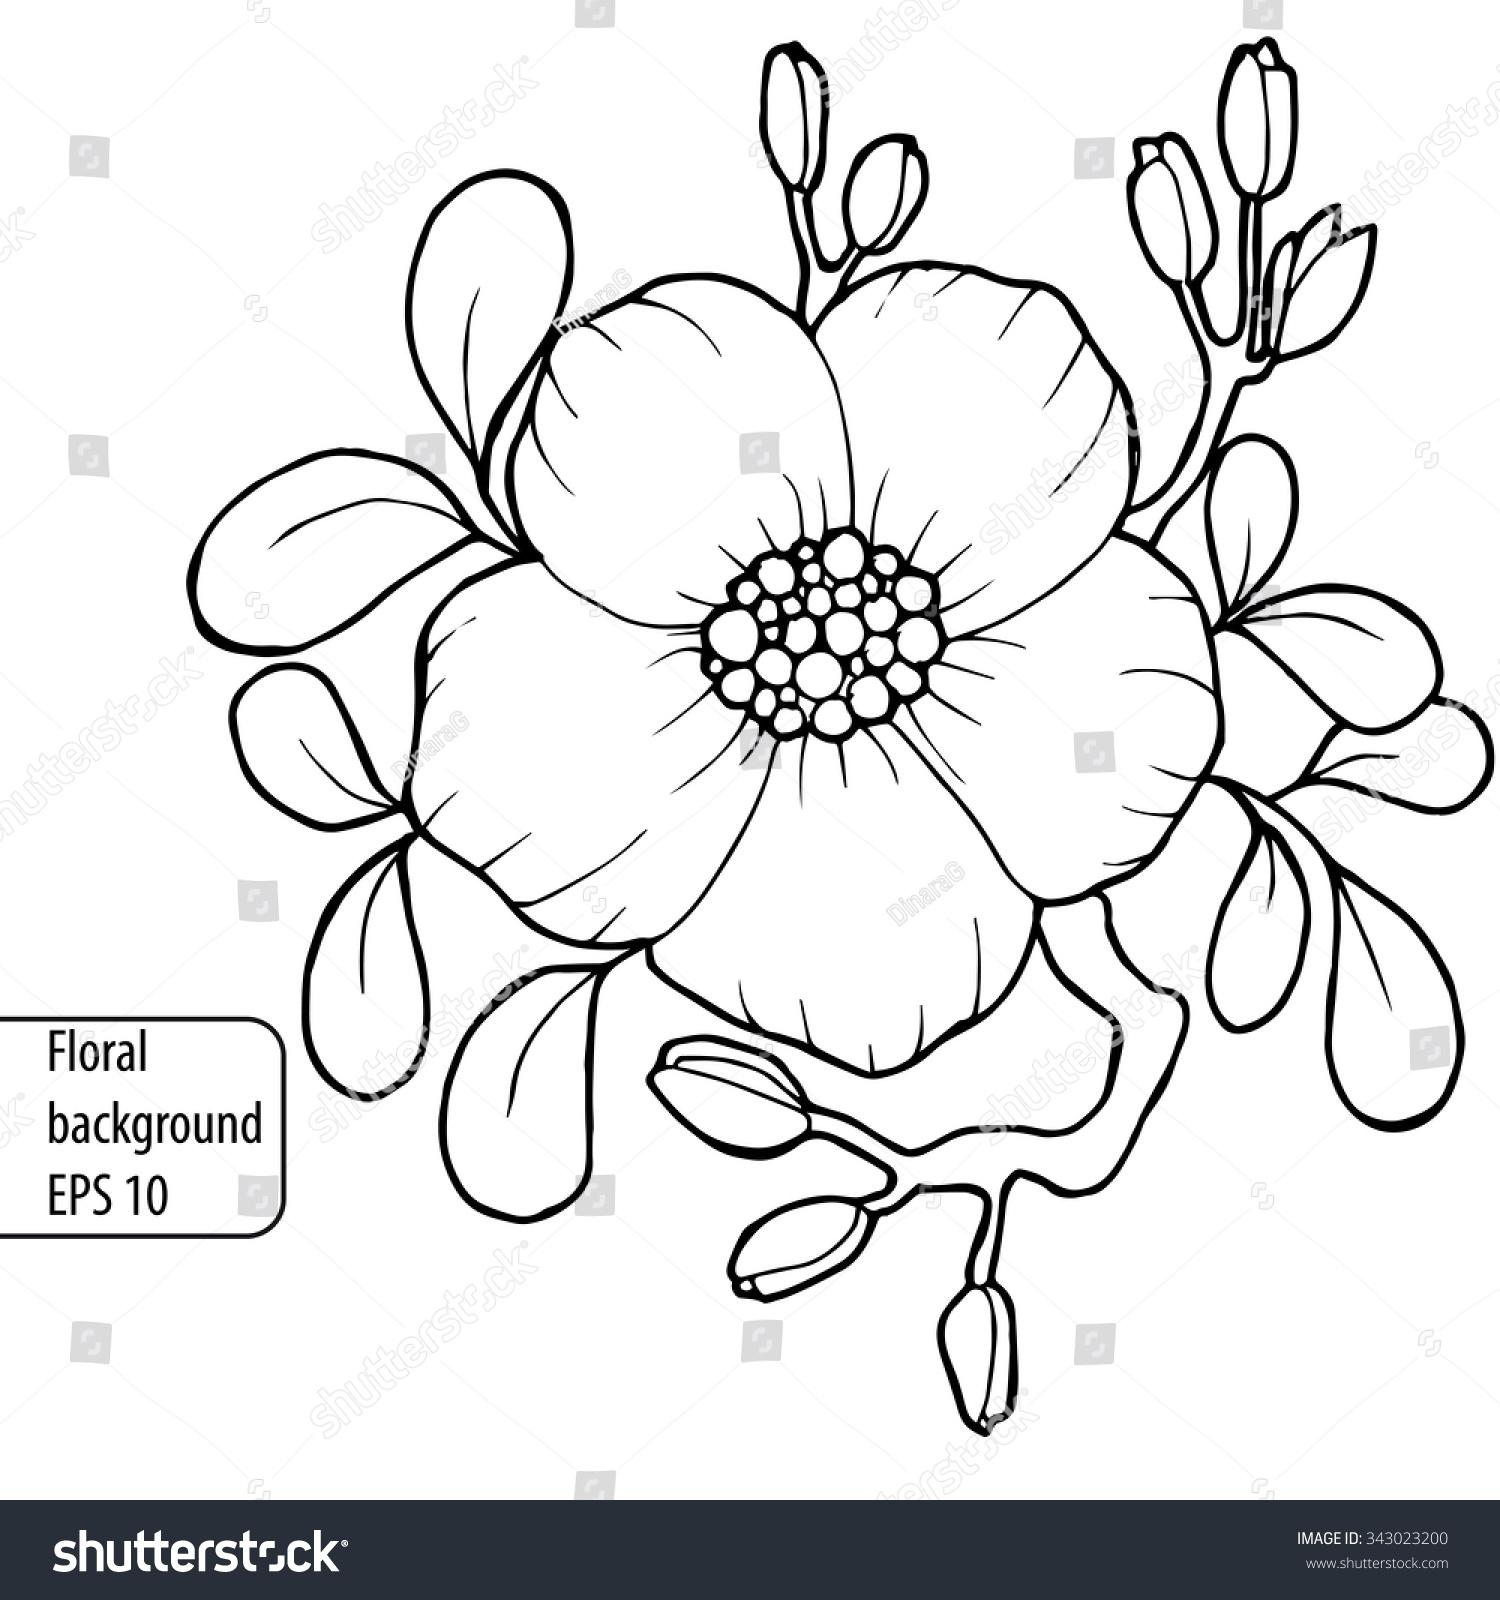 Vintage Handdrawn Black White Background Flowers Stock Vector